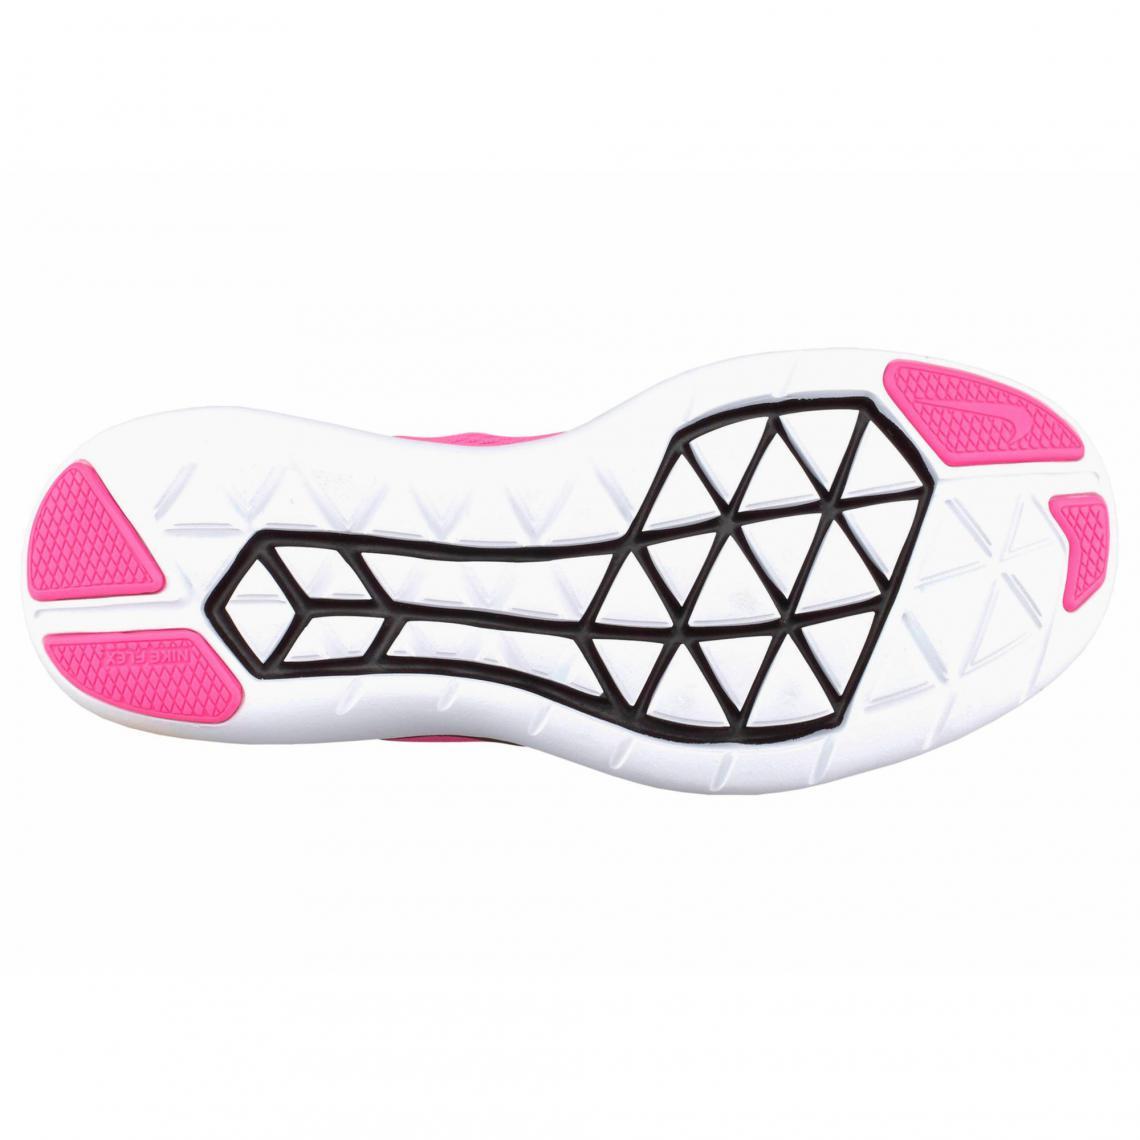 a8b3826c8ab Nike Flex 2016 RN chaussures de running femme - Rose Nike